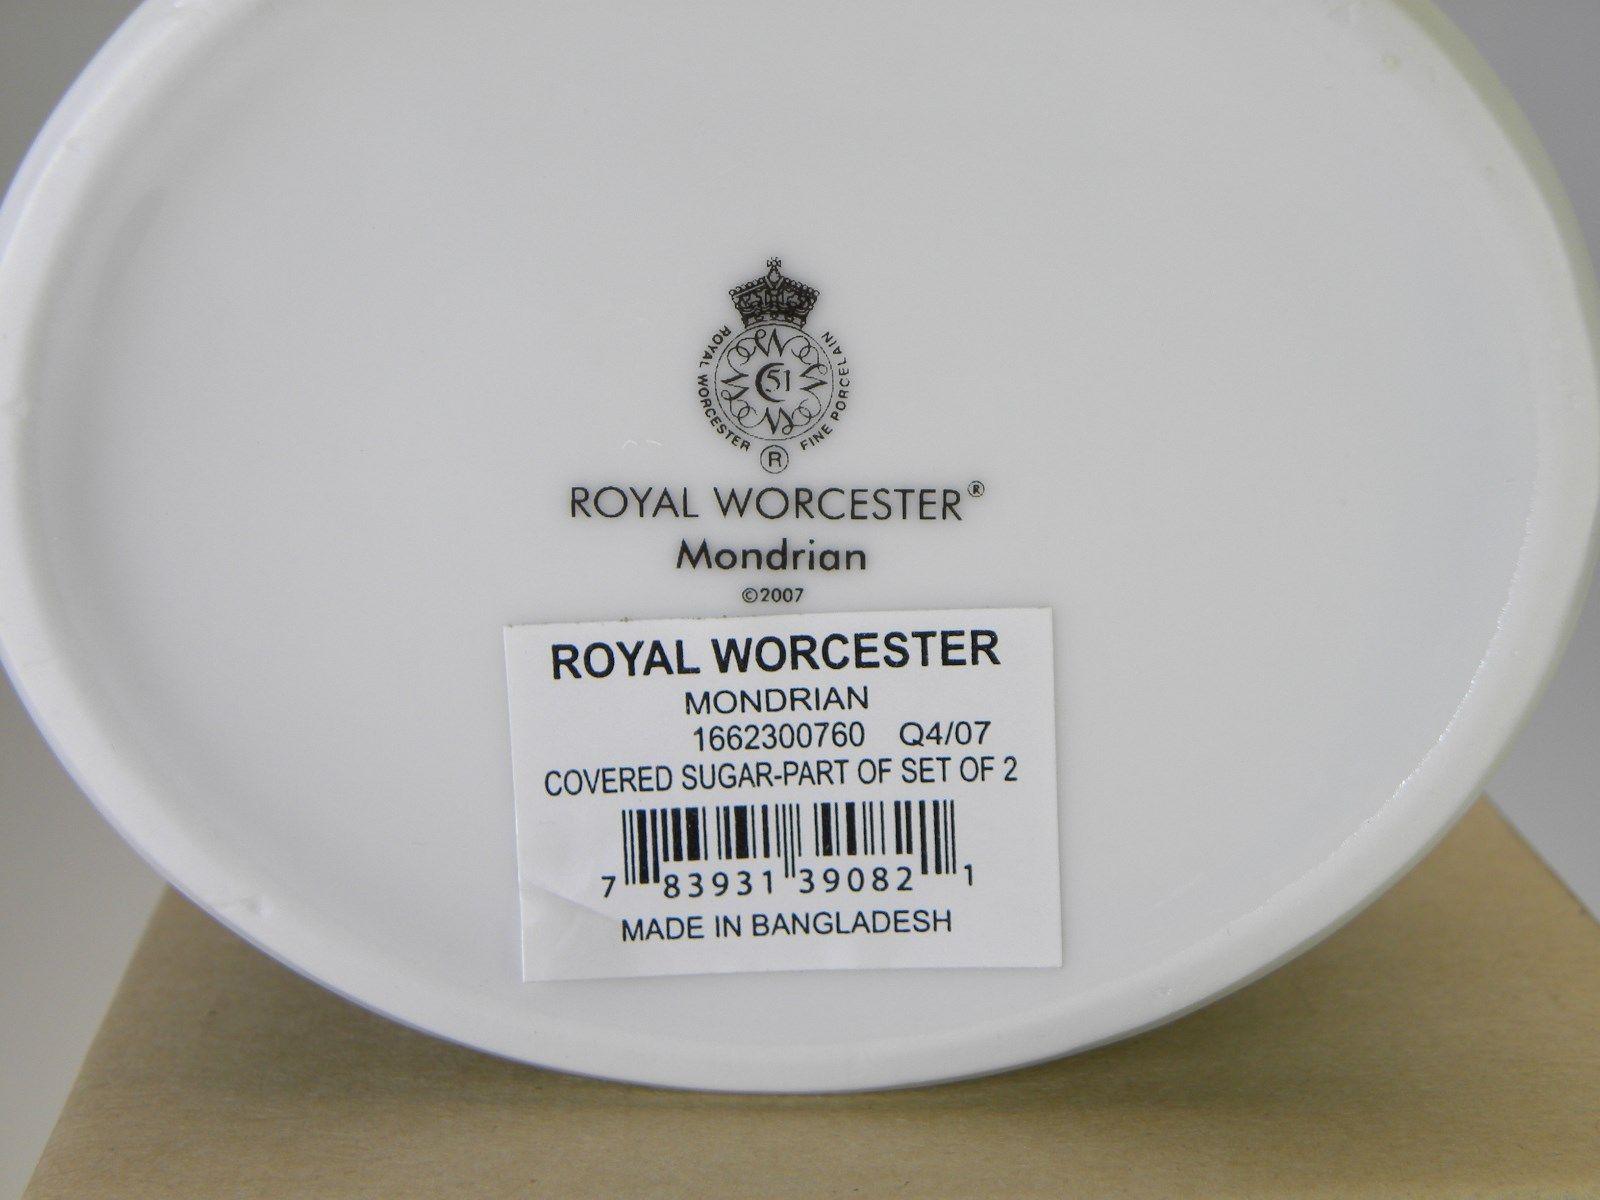 Royal Worcester Mondrian Covered Sugar